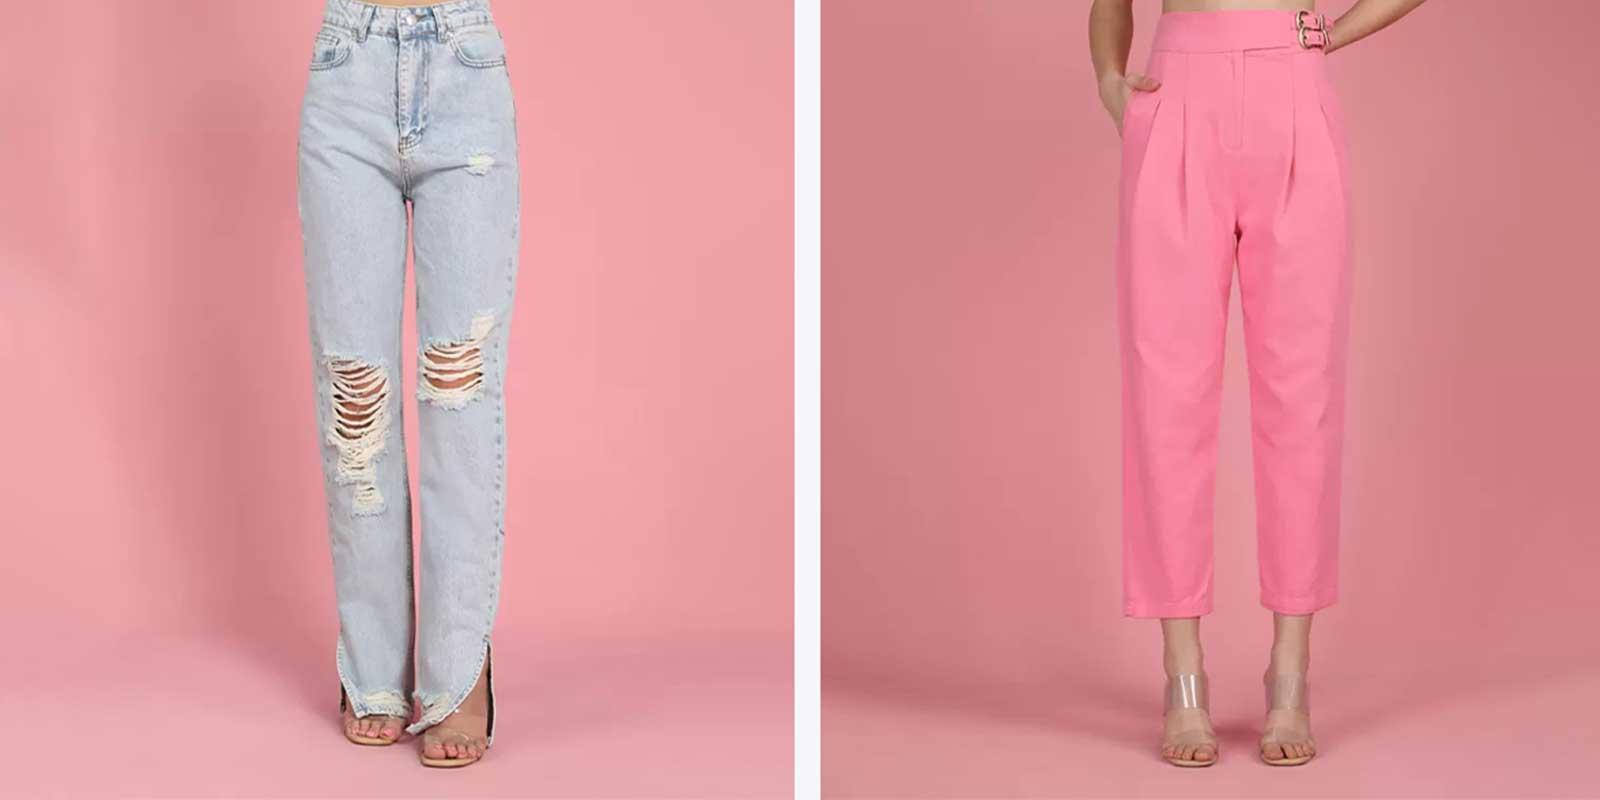 2021'de Trend Olan Jean Modelleri